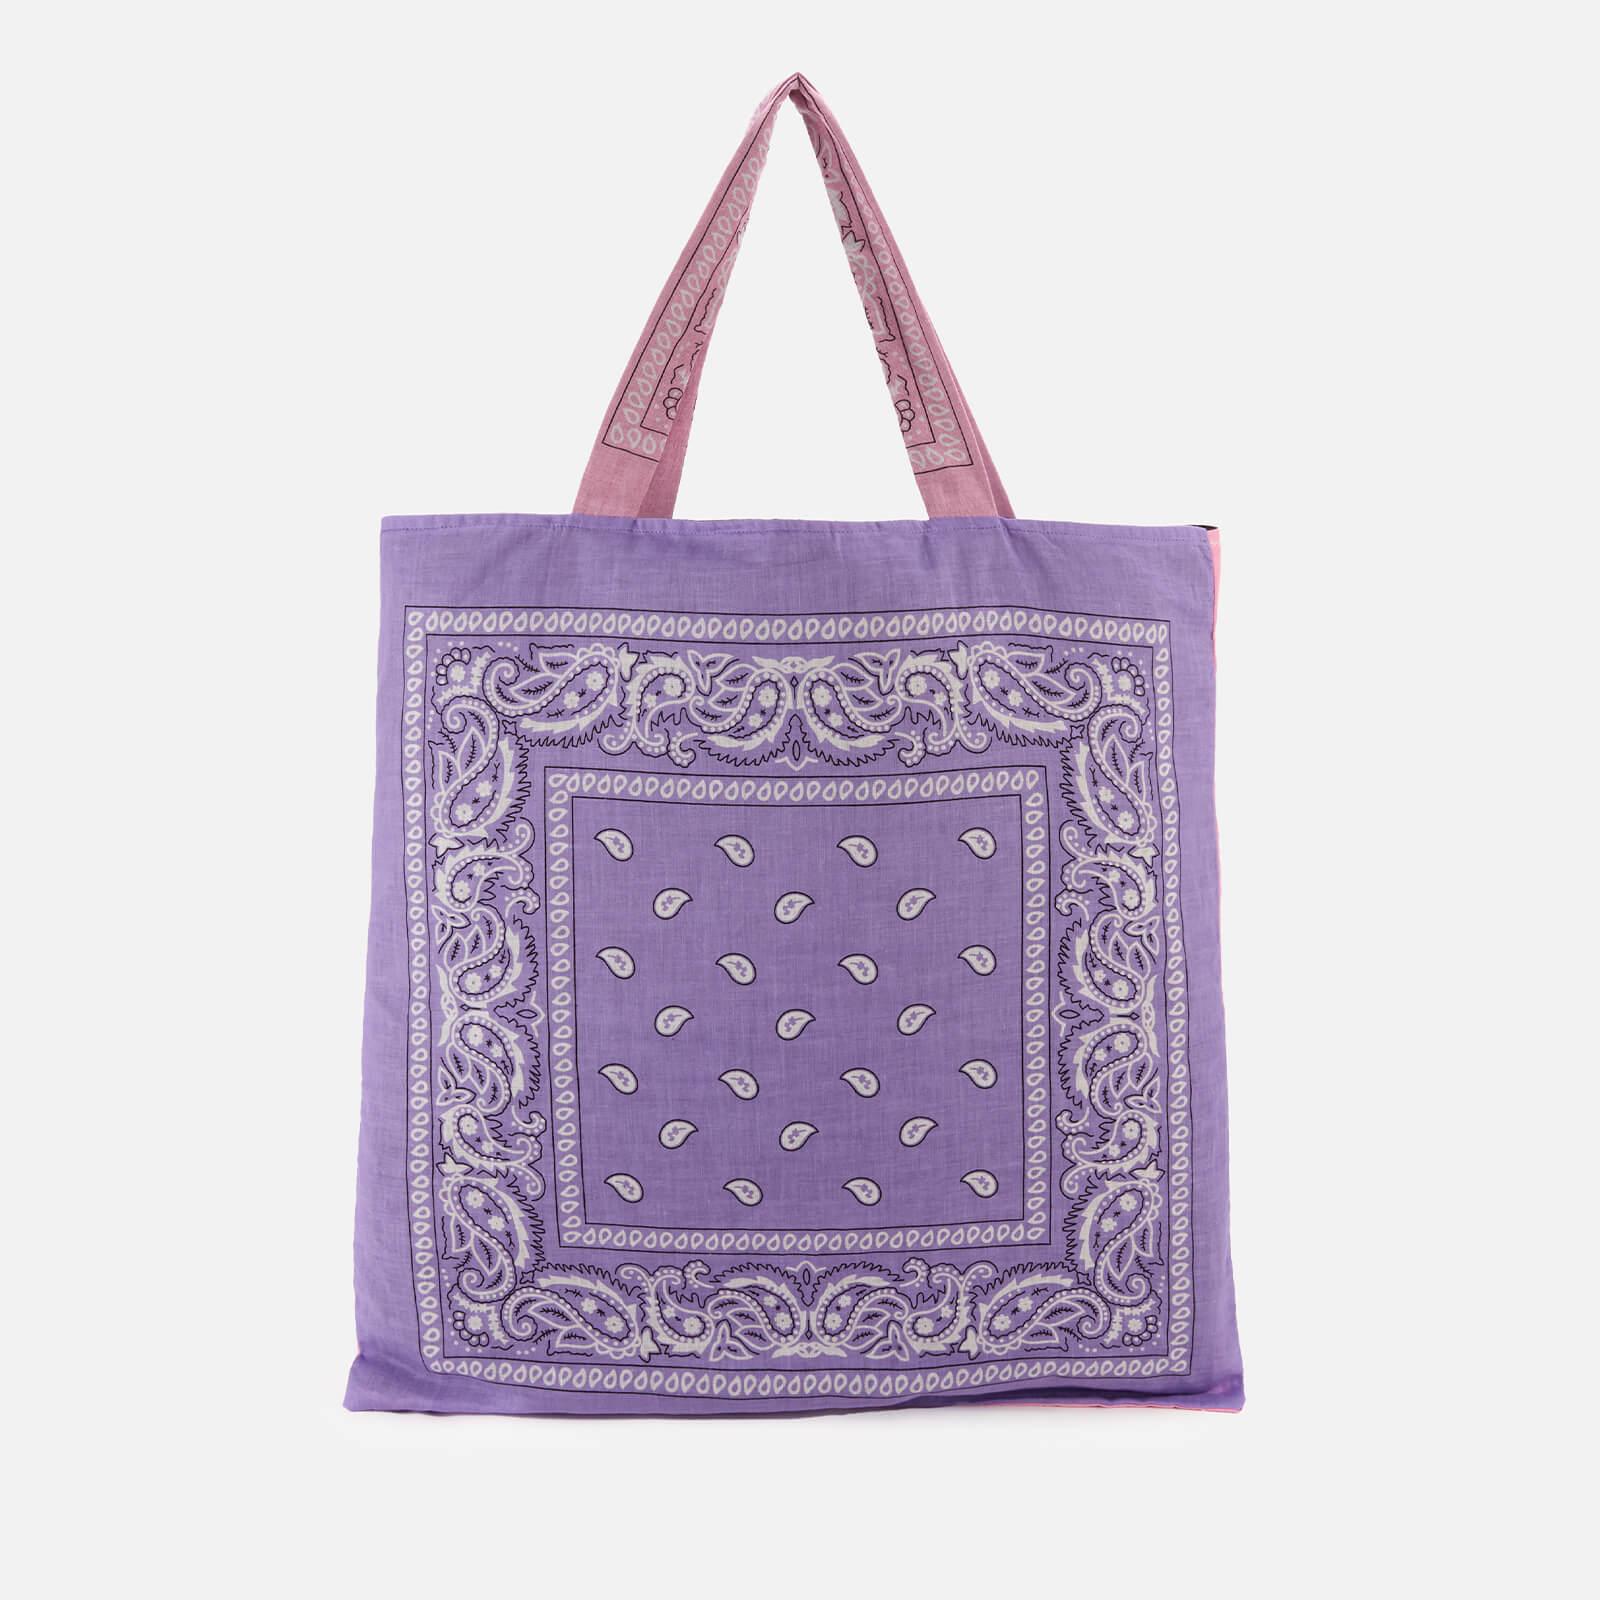 Arizona Love Women's Bandana Beach Bag - Pink/Violet